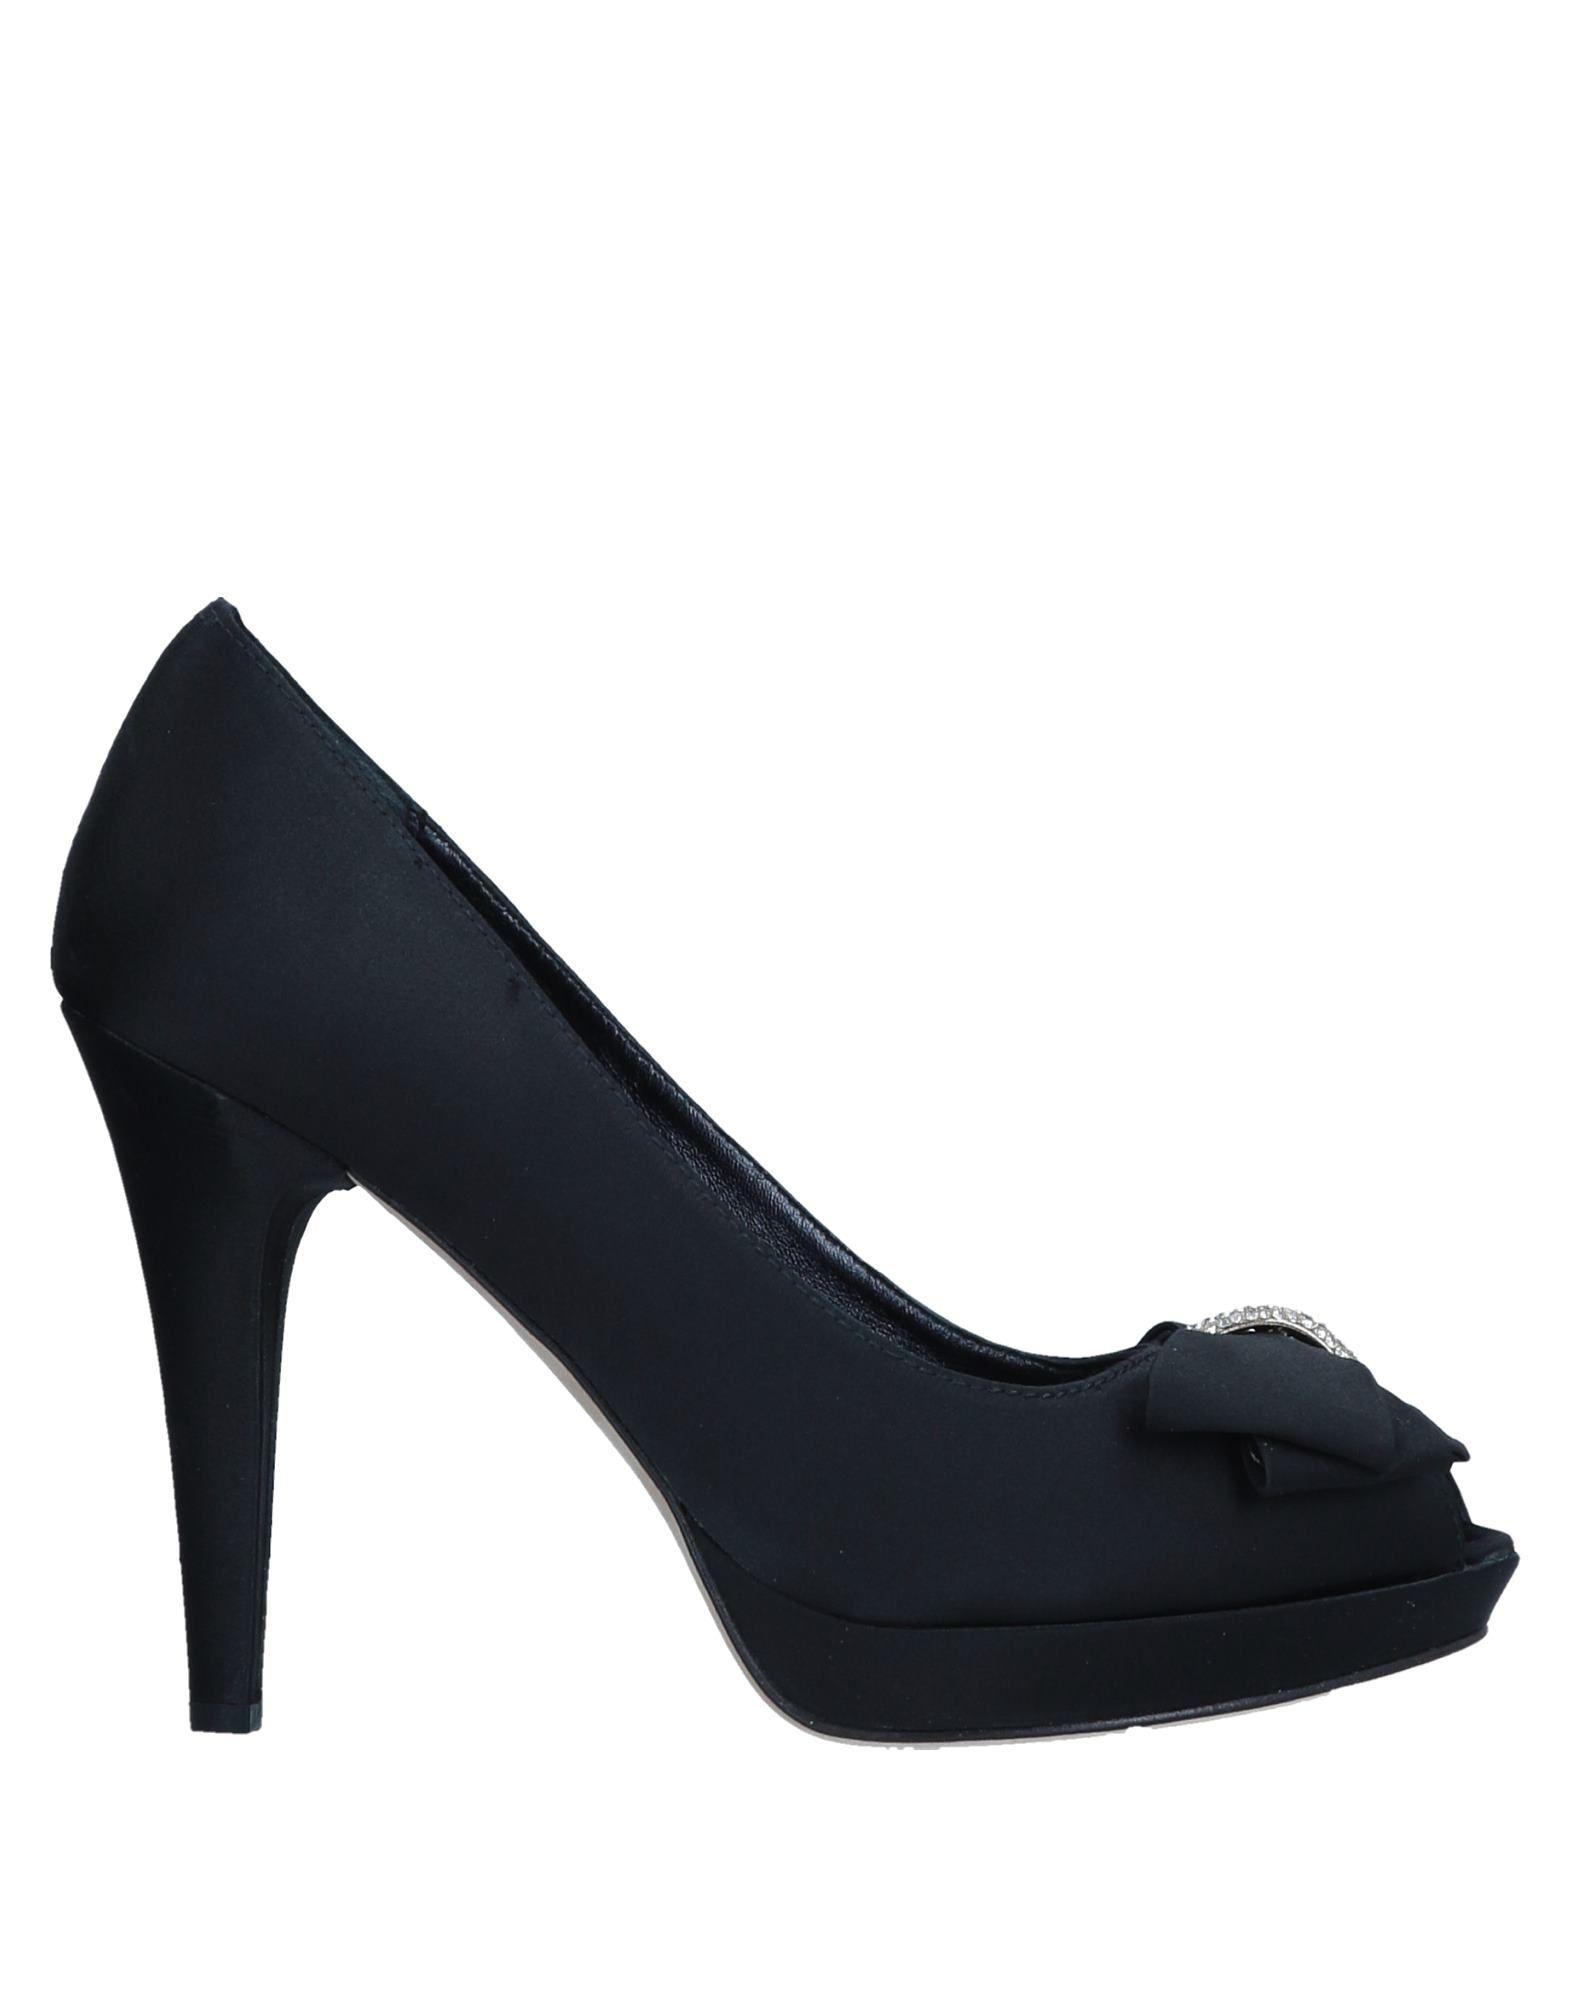 Barachini Gute Pumps Damen  11548665UO Gute Barachini Qualität beliebte Schuhe 3e7171